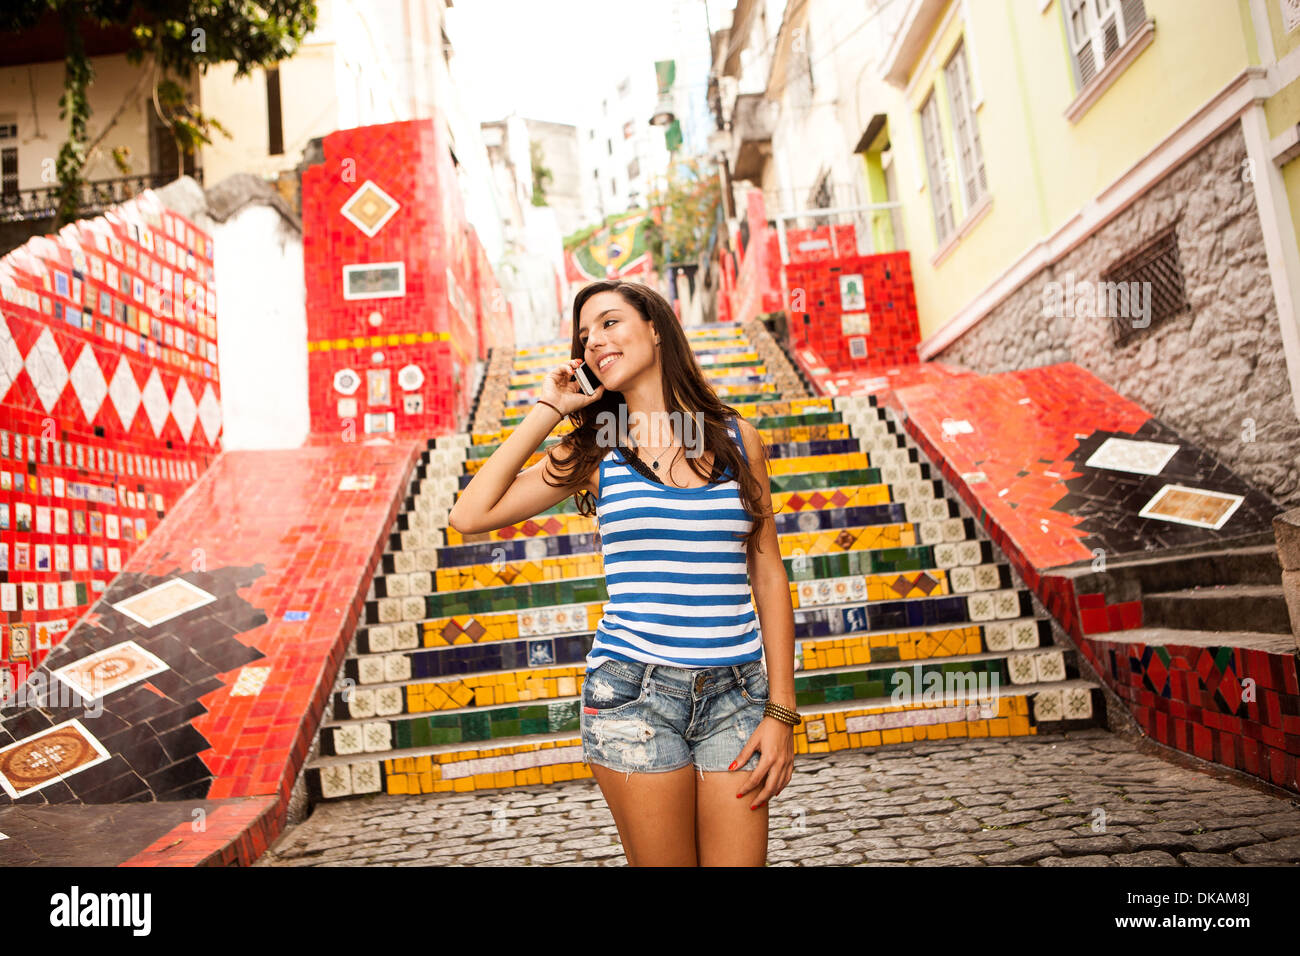 Young woman on phonecall in front of the Escadaria Selaron steps in Rio de Janiero, Brazil - Stock Image